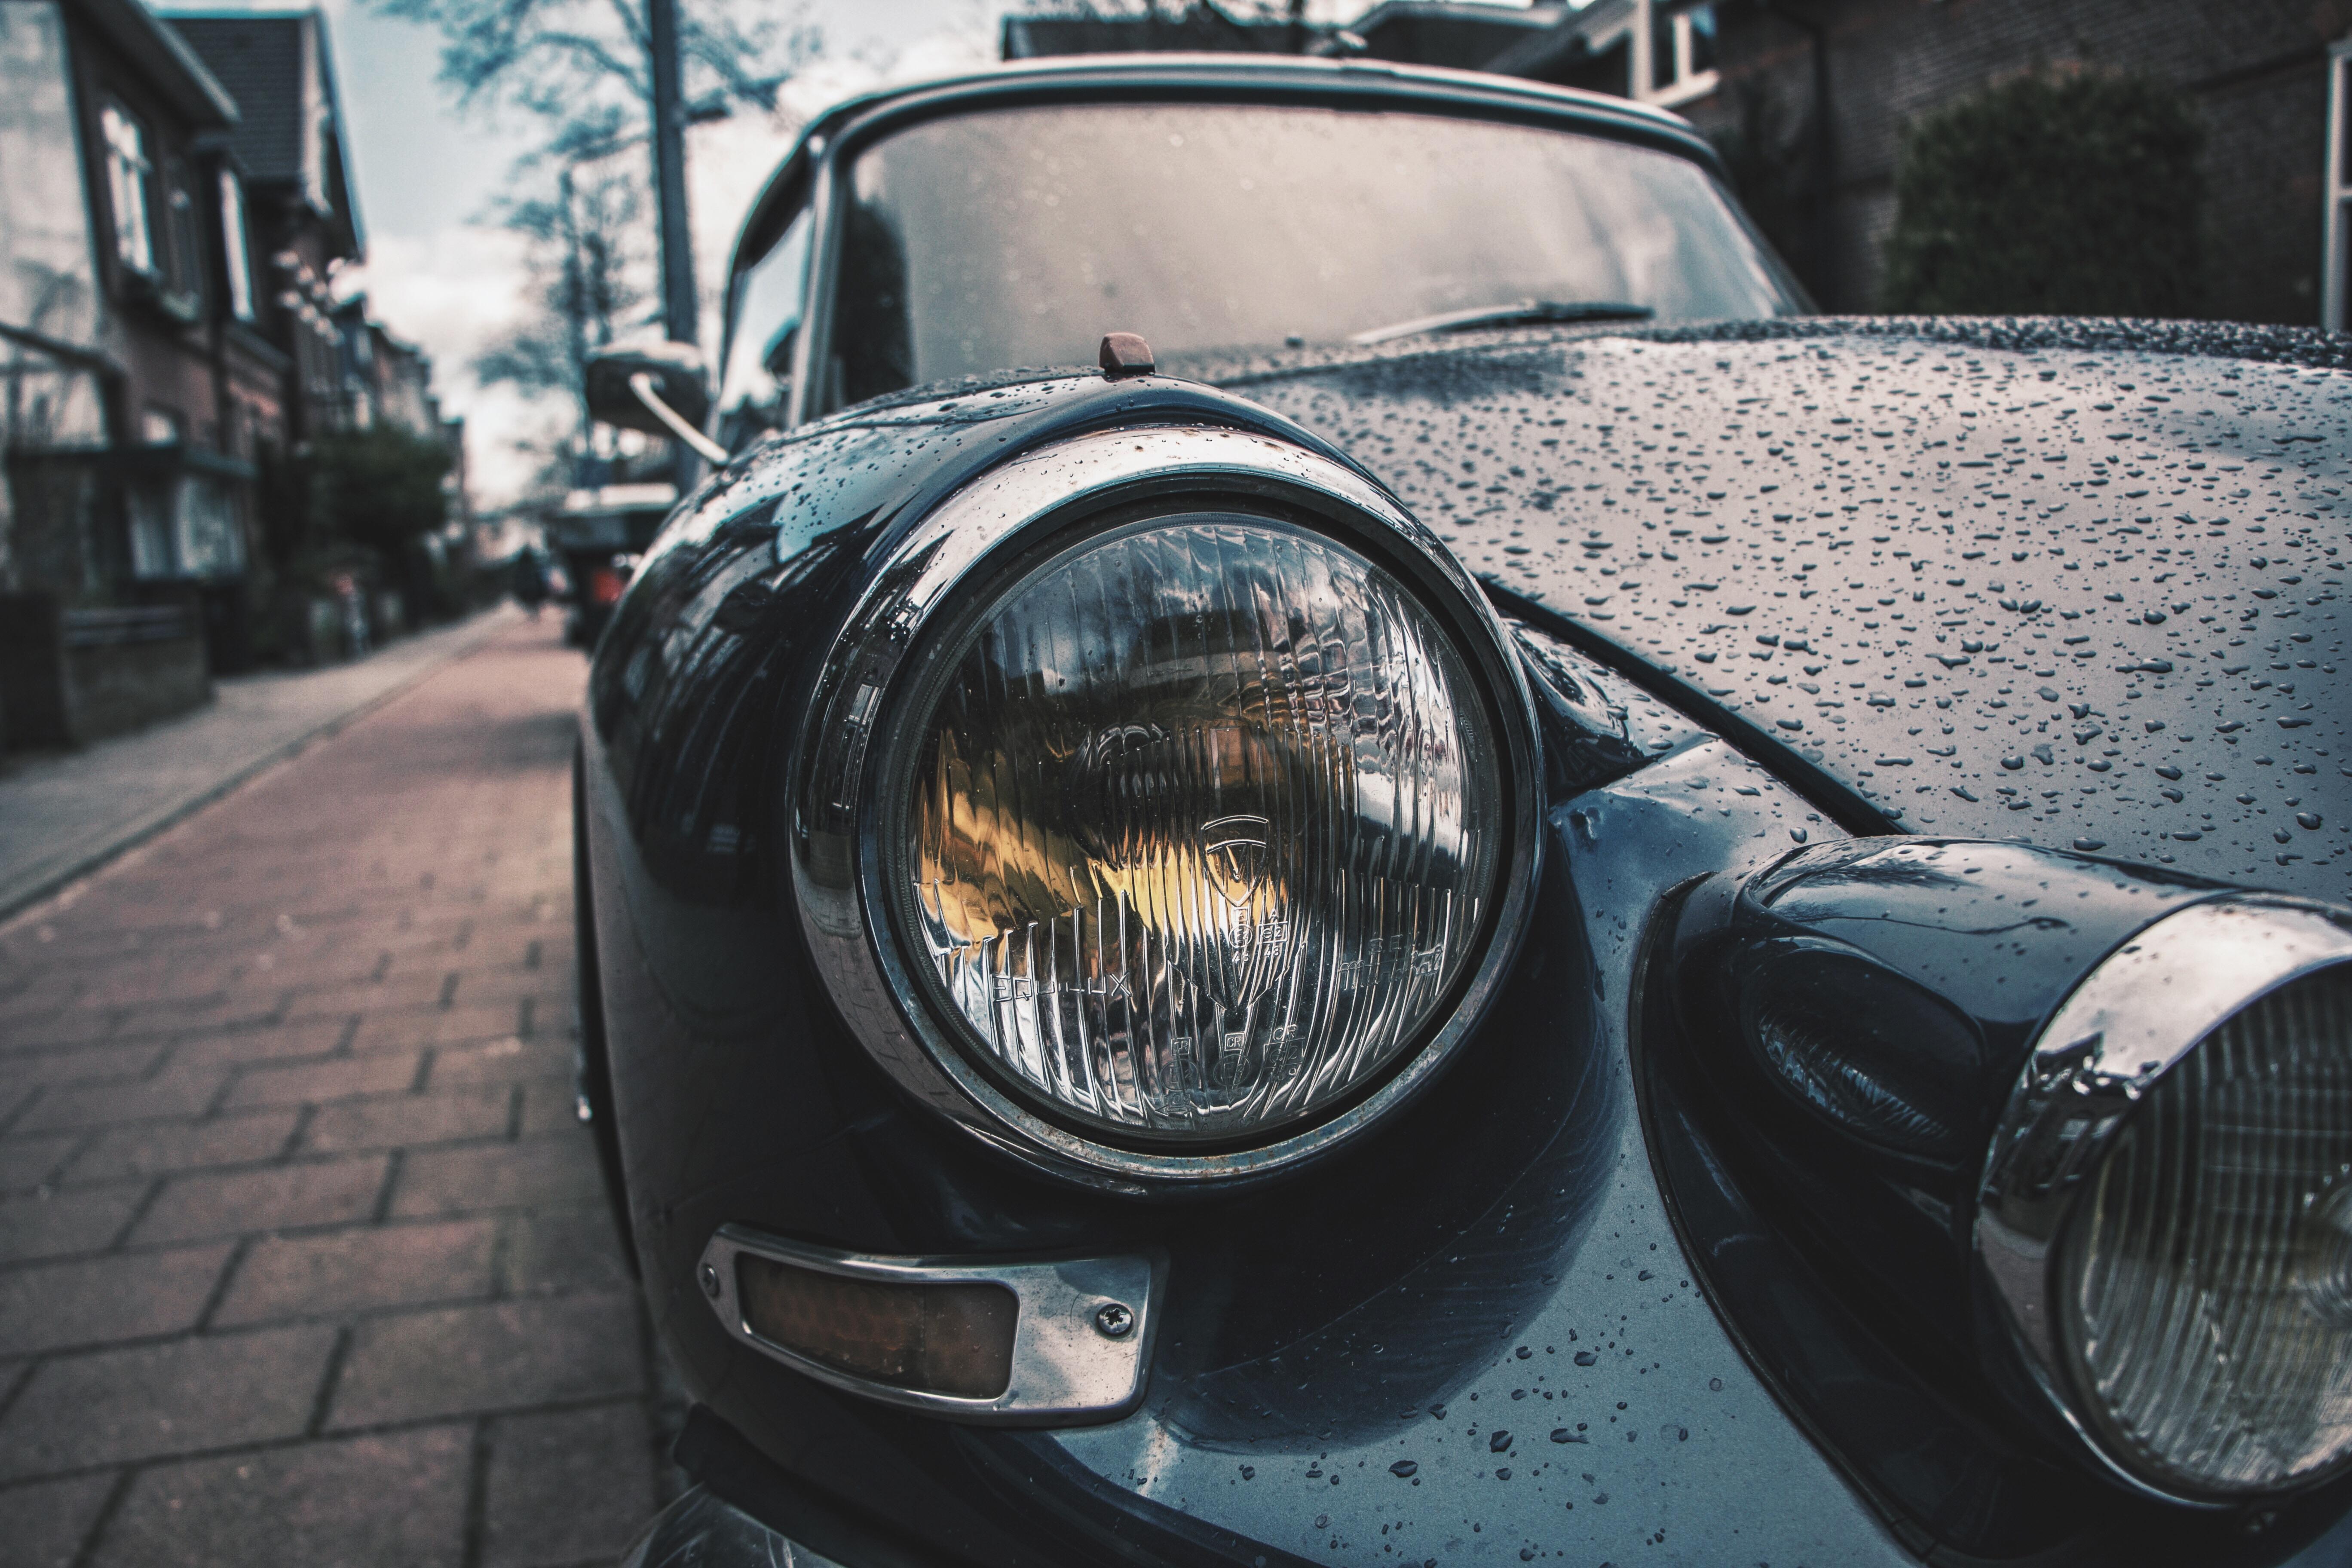 Free Images : wheel, retro, windshield, auto, headlight, sports car ...